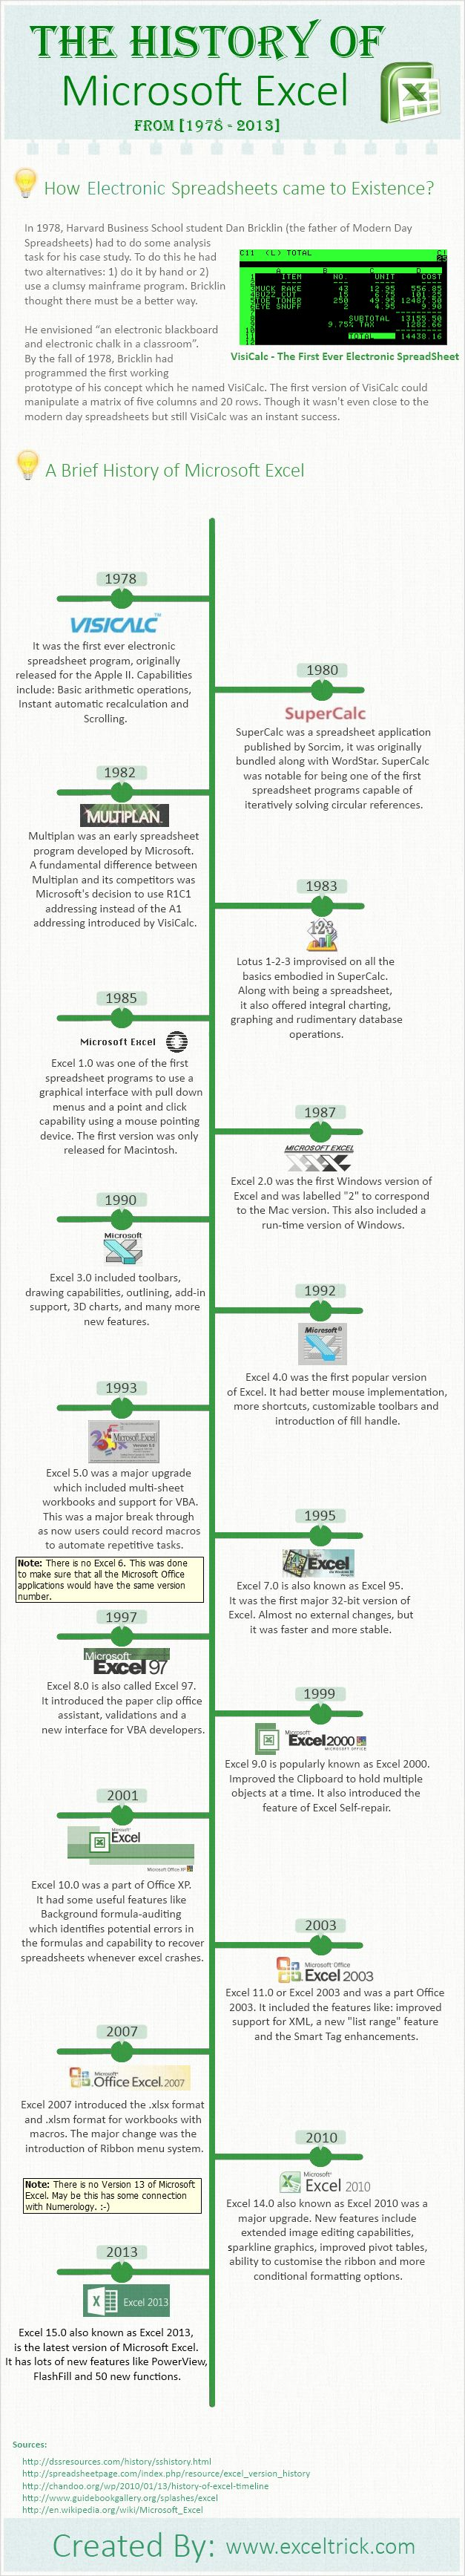 Historia de Microsoft Excel #infografia #infographic #software